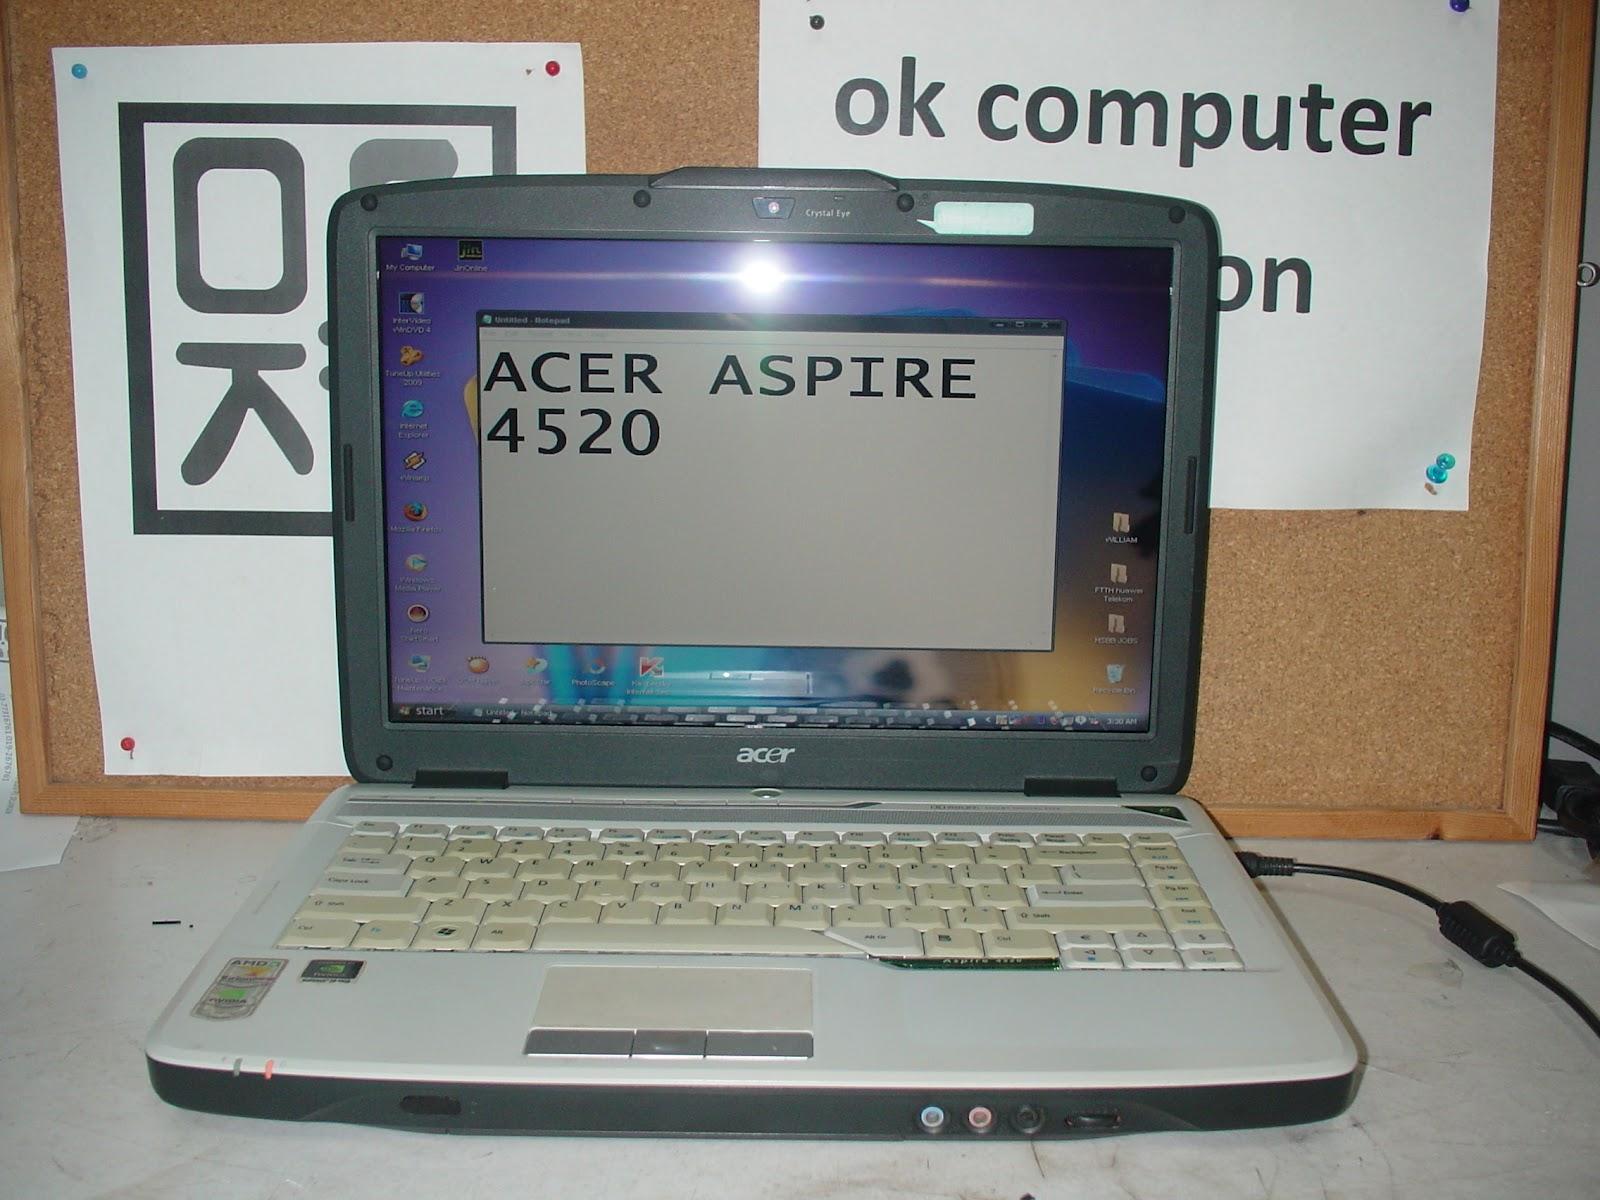 Laptop Screen Repair Acer Aspire Parts Diagram Pictures